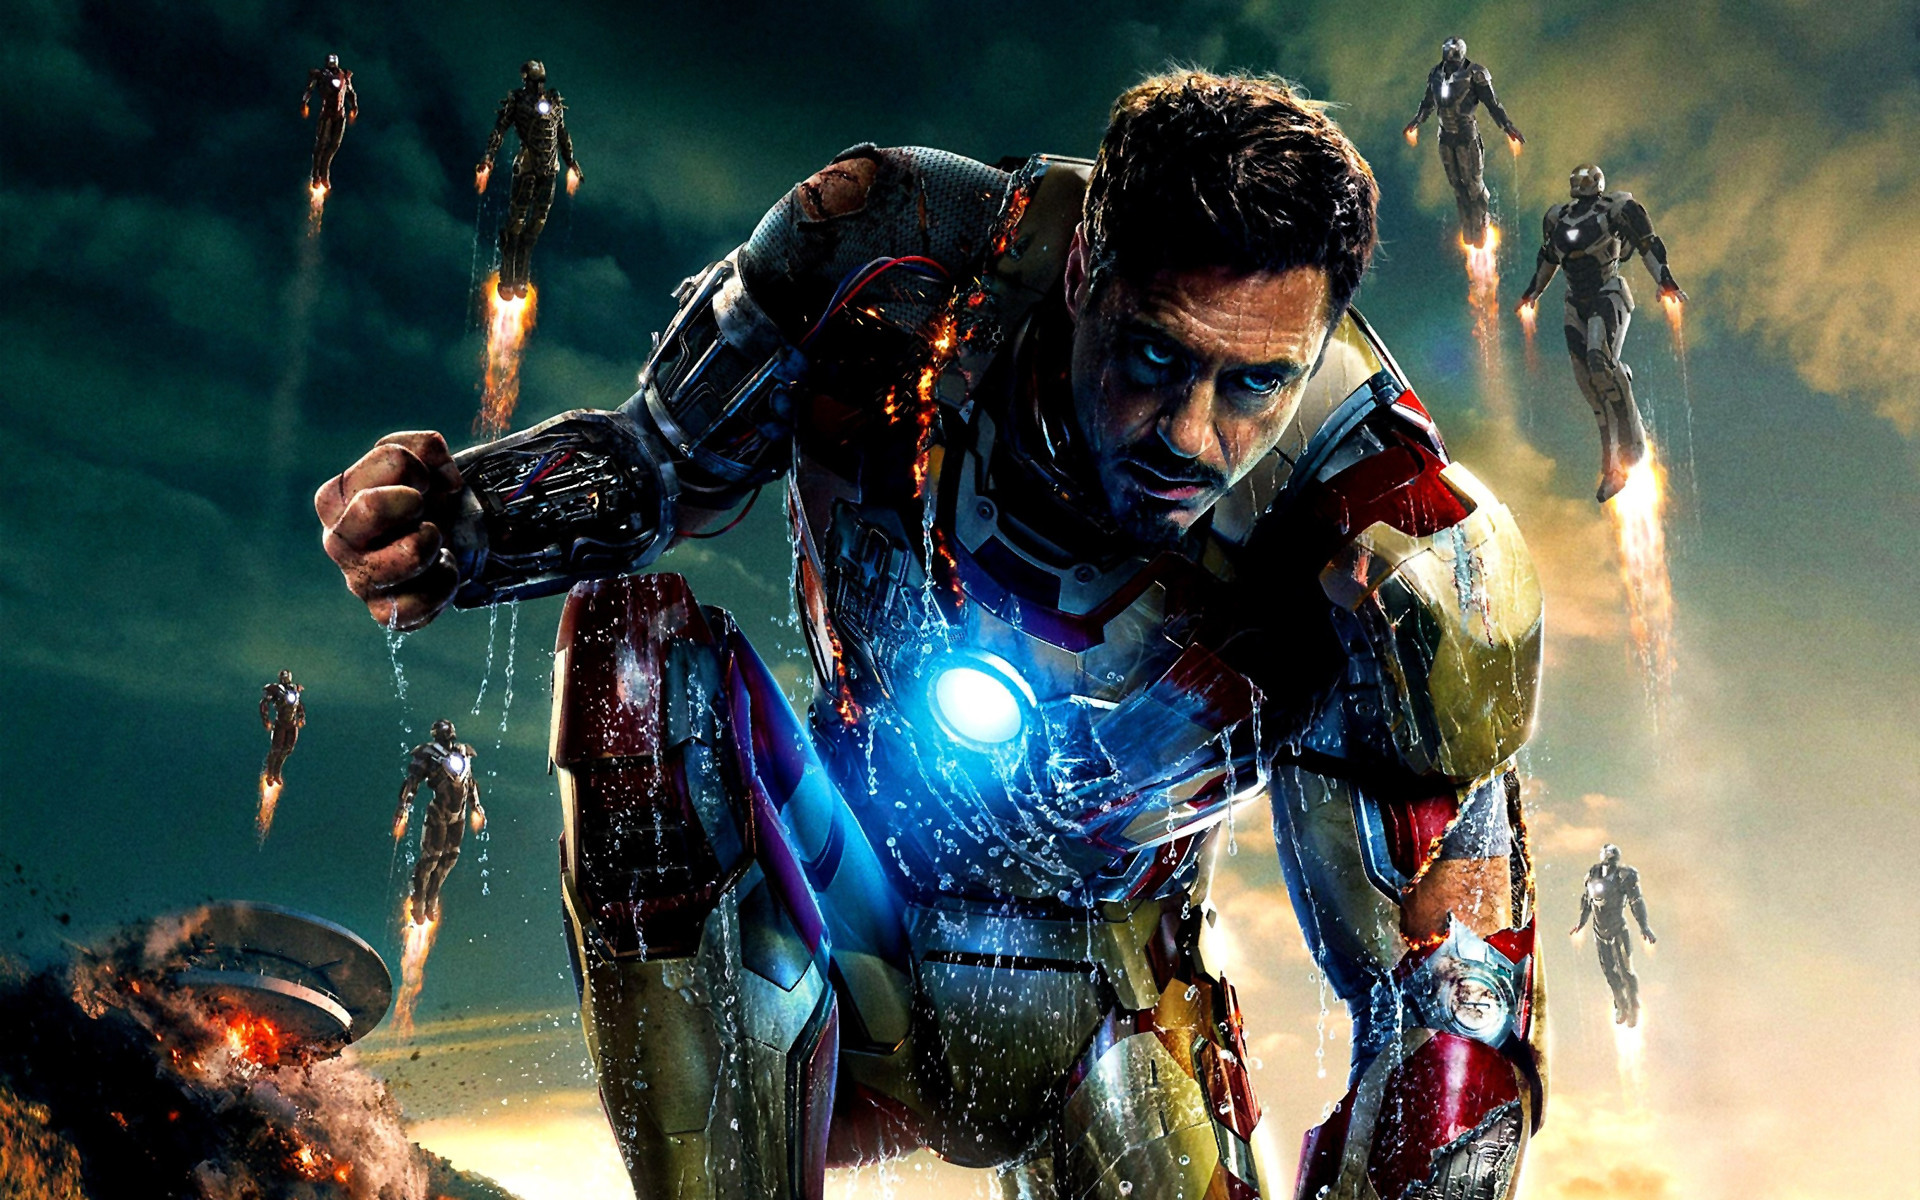 Iron Man Broken Screen Wallpaper 52 Images